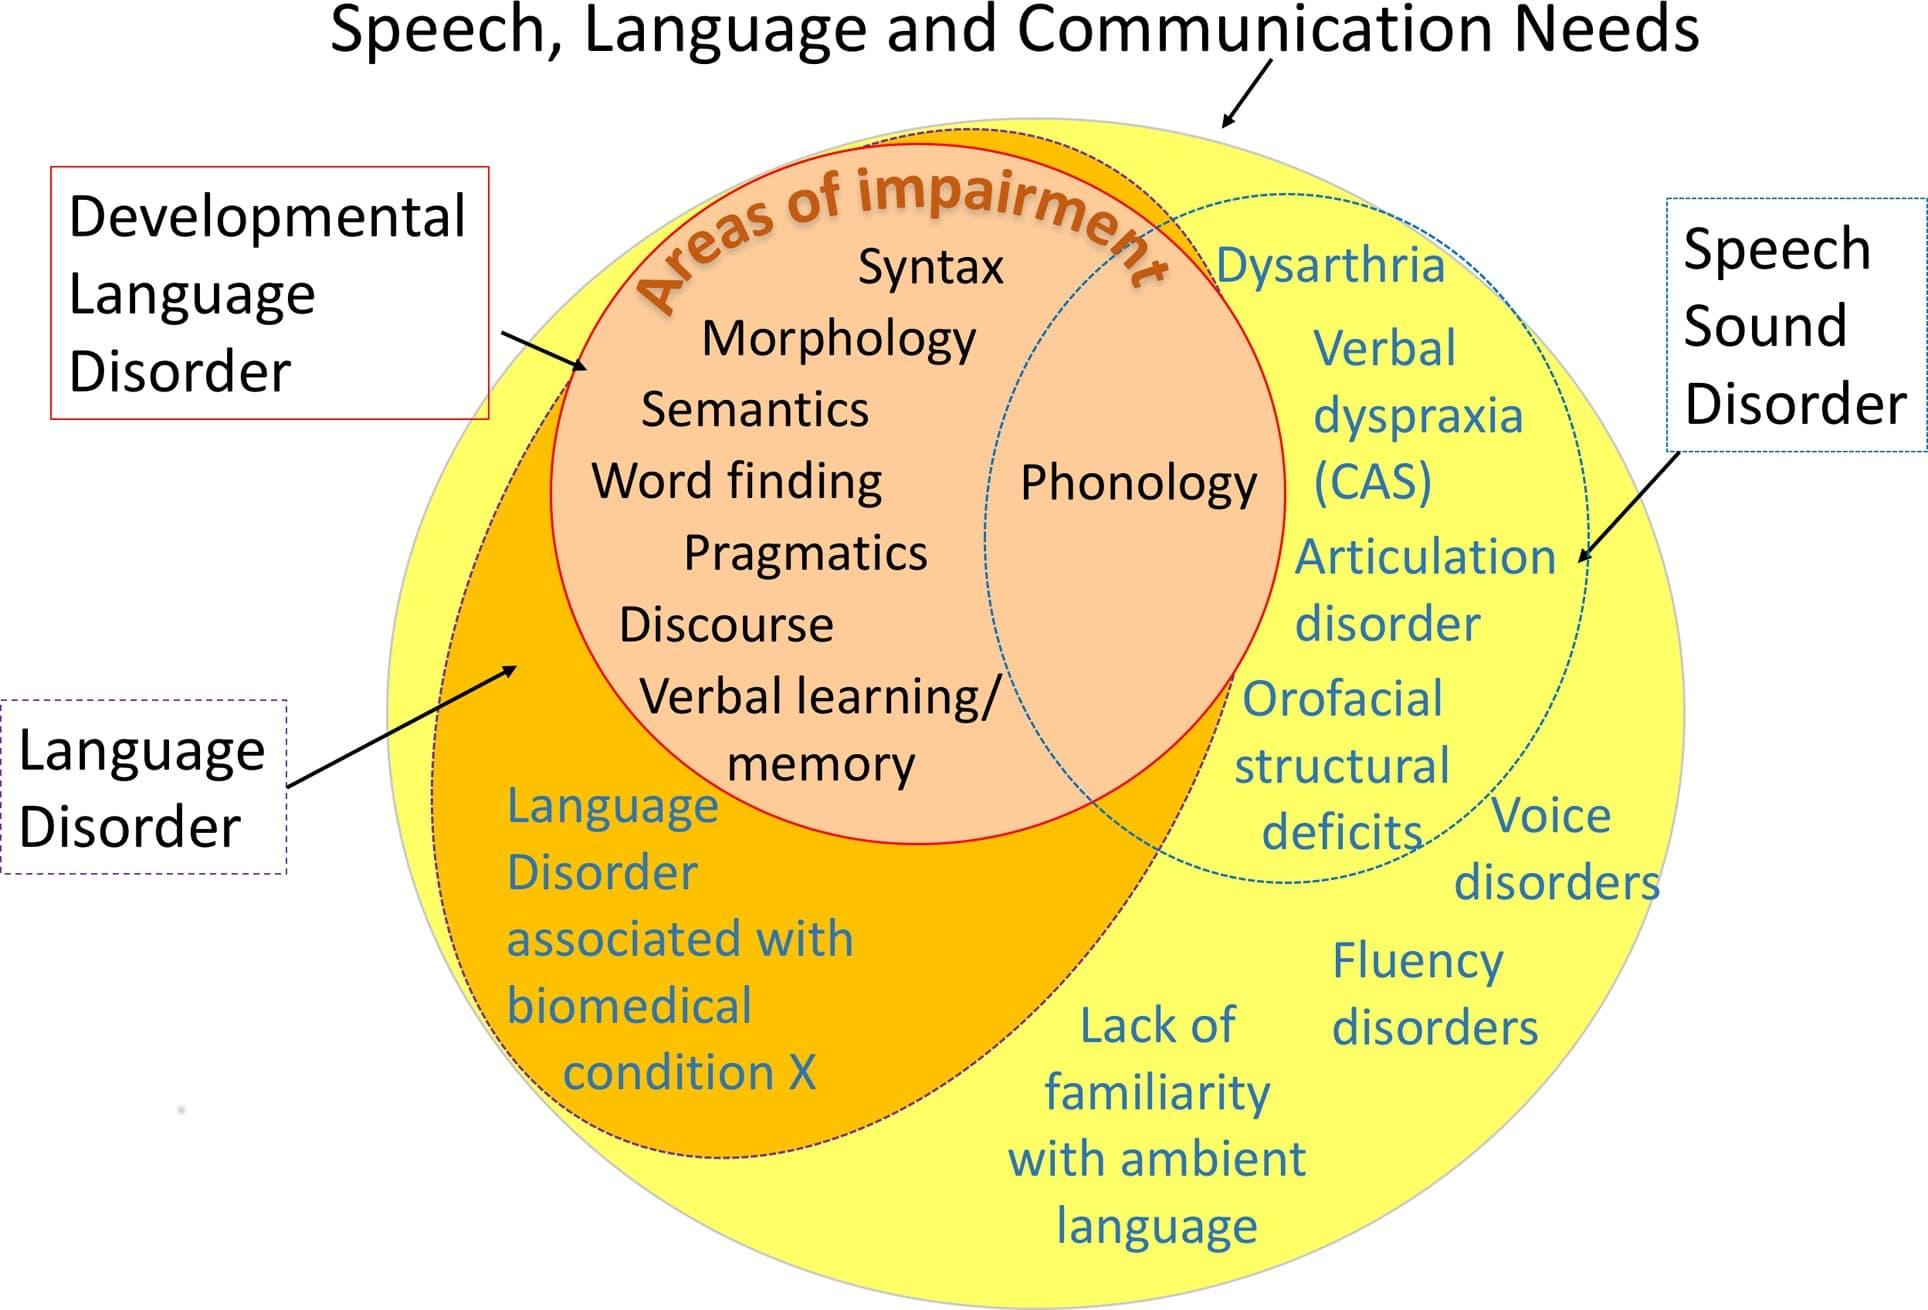 A diagram displaying Speech, Language and Communication Needs